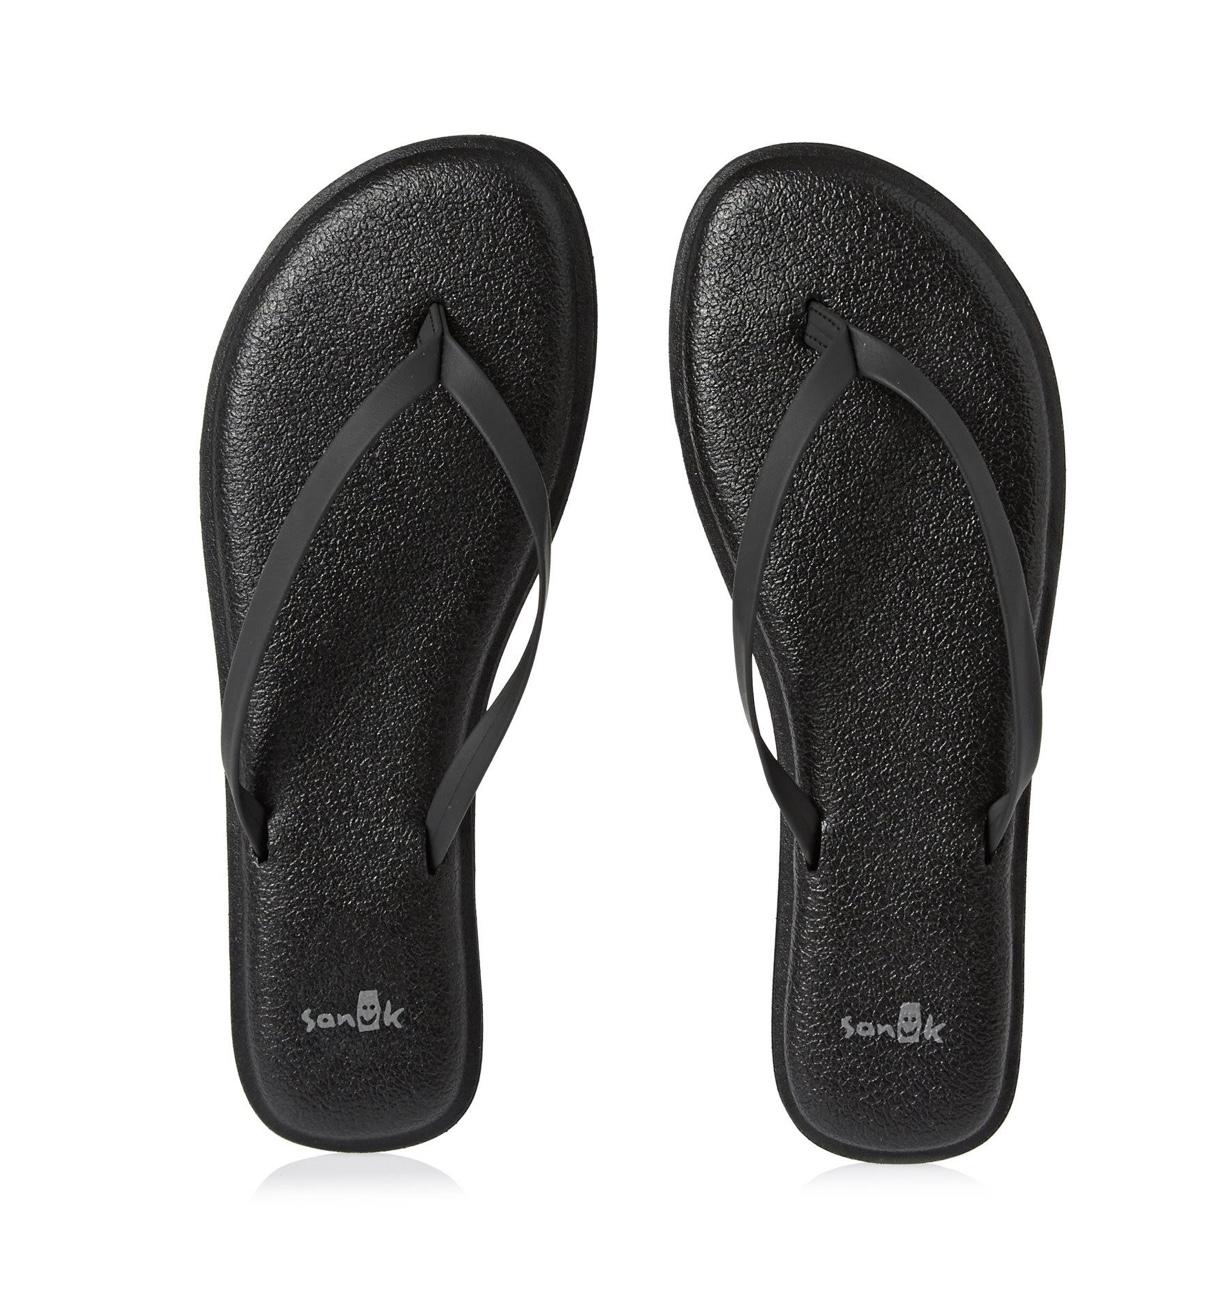 SANUK YOGA BLISS BLACK - 6th Street Fashions & Footwear ...